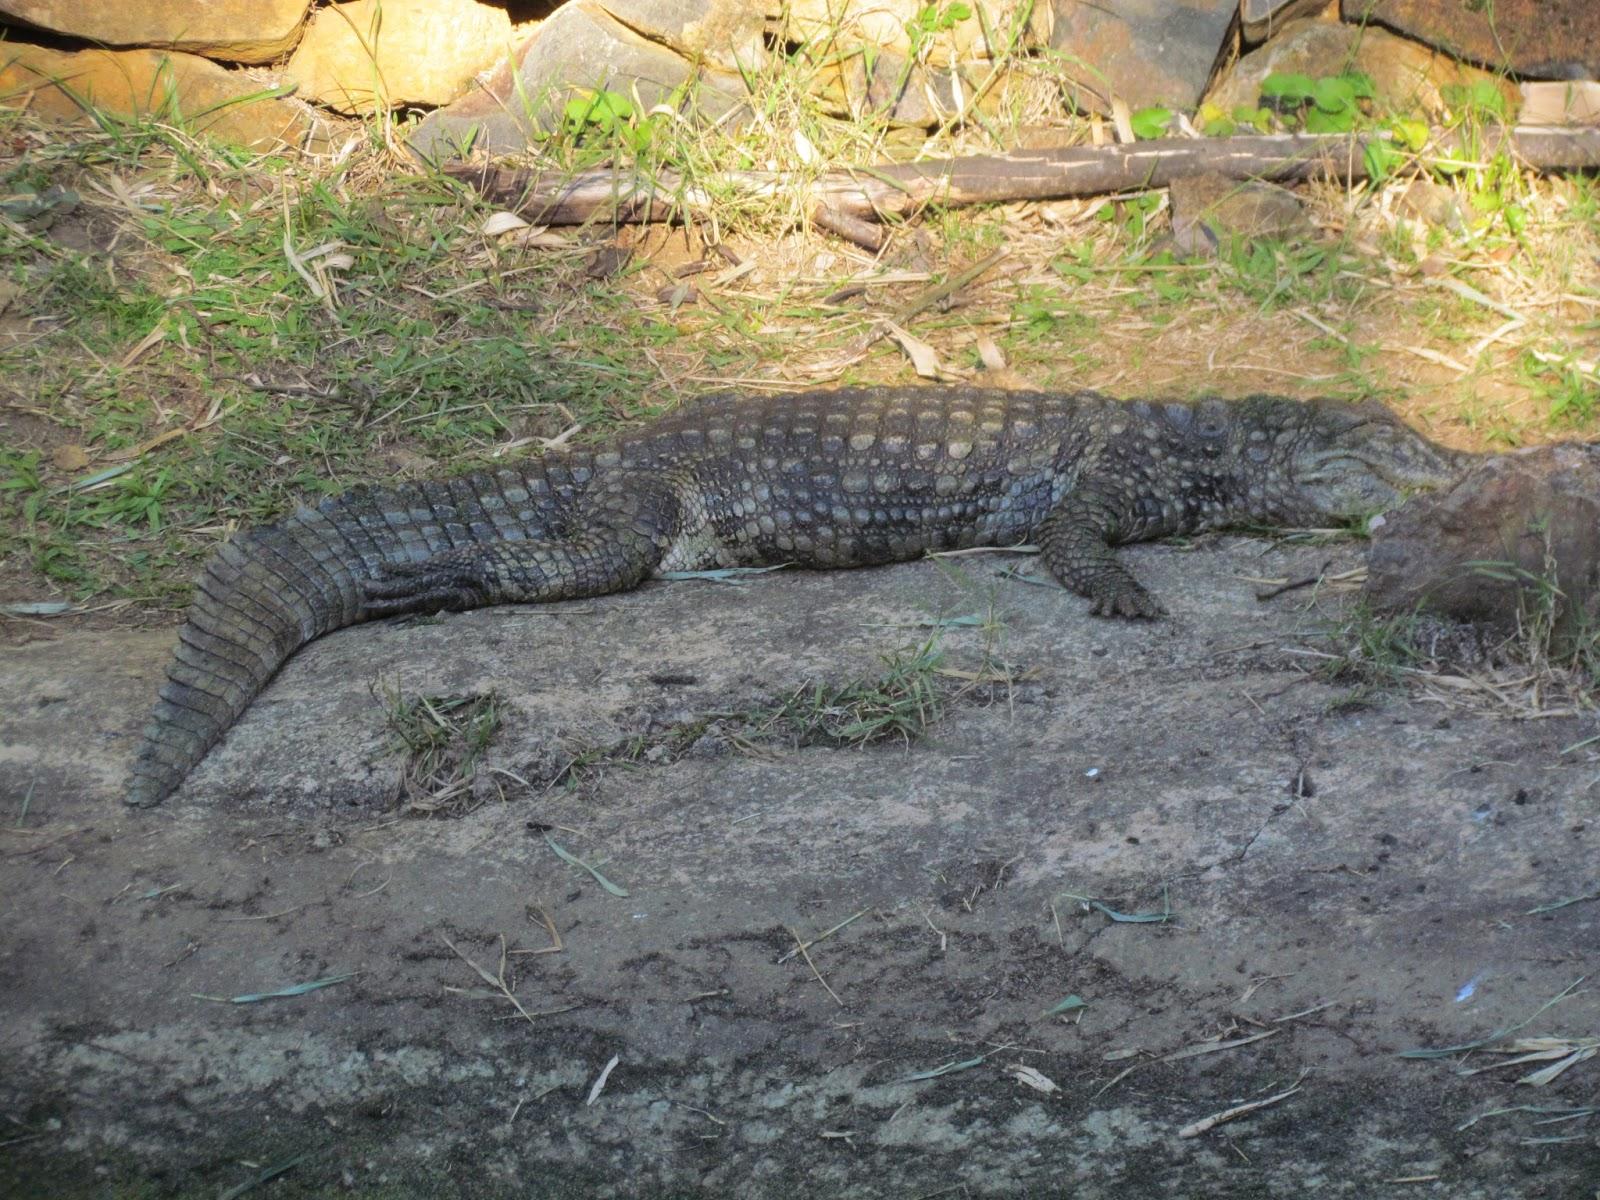 zoológico de Gramado